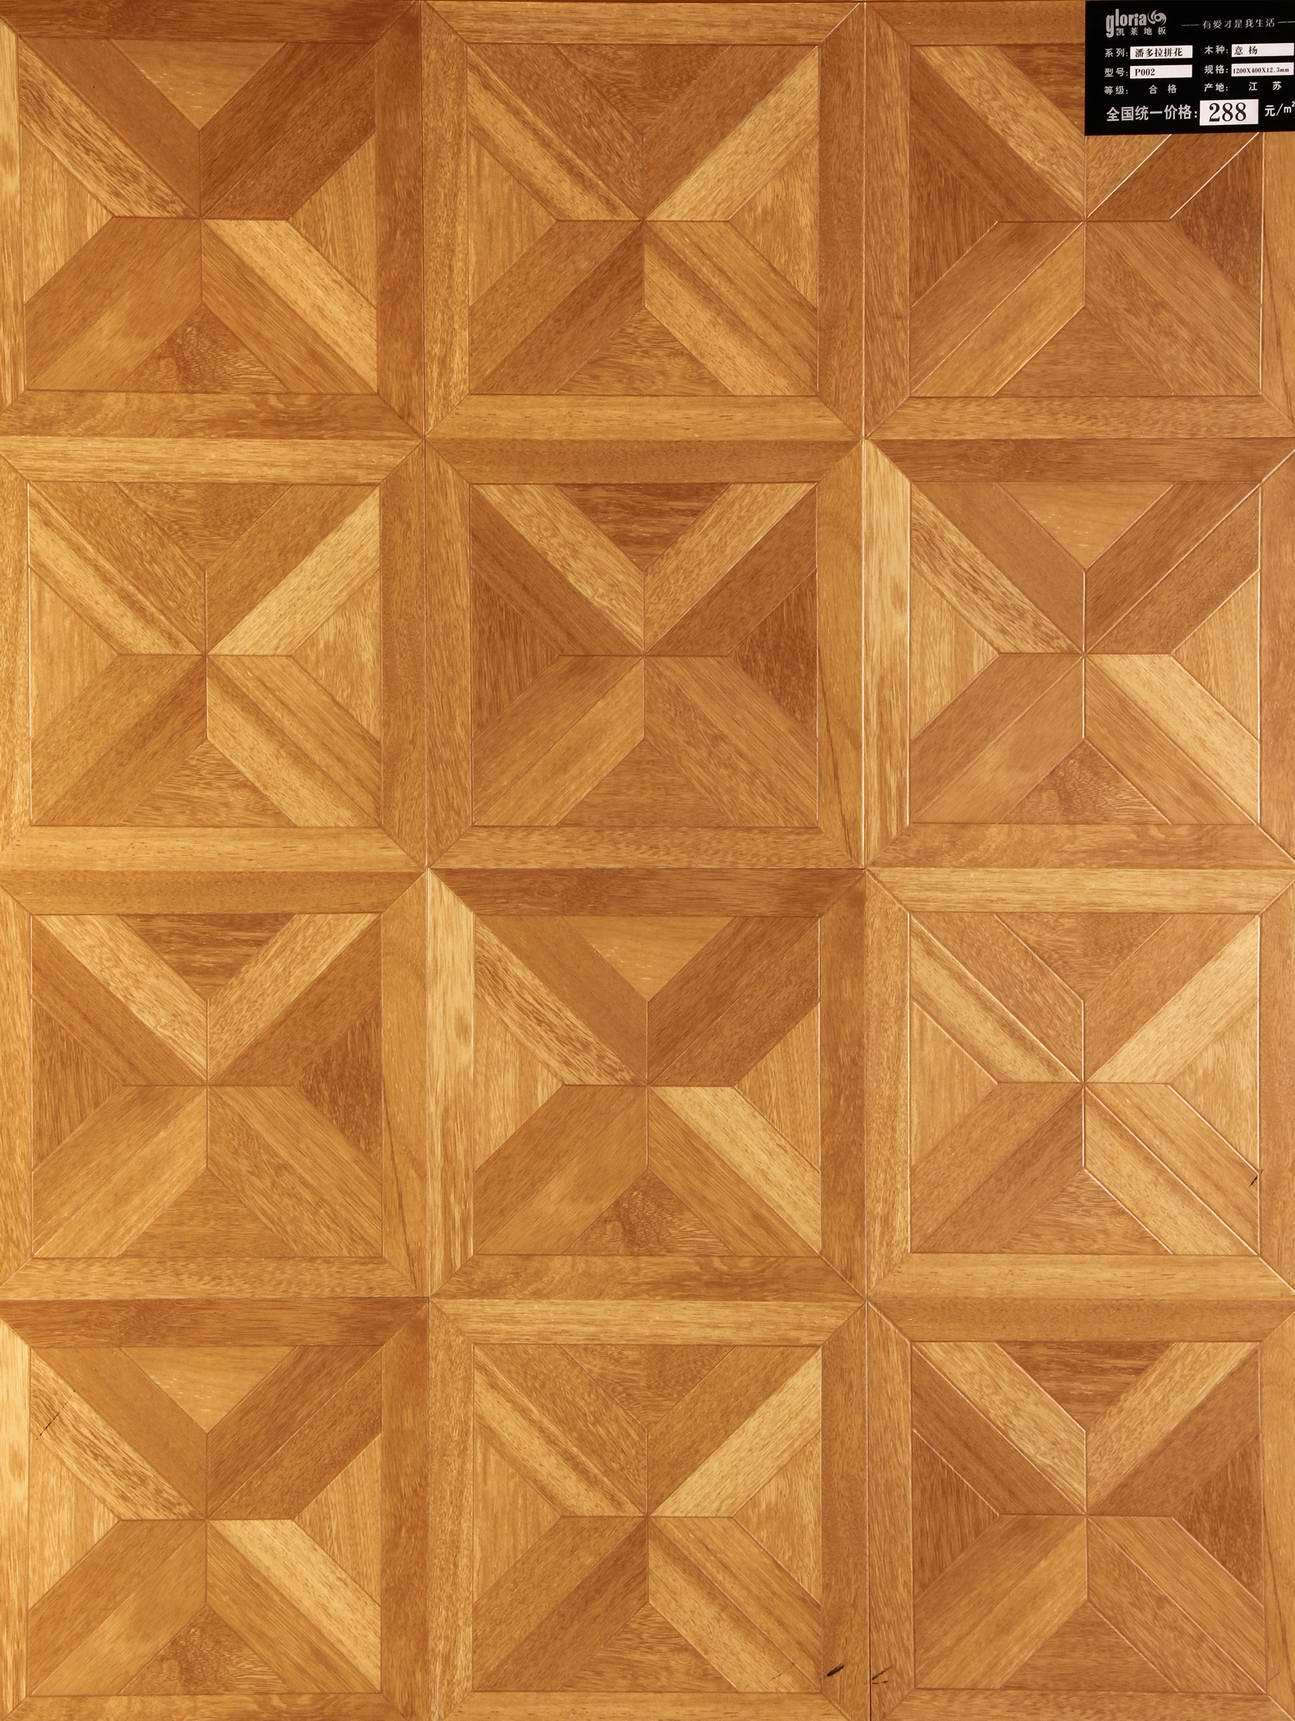 Parquet Flooring | decorating zen